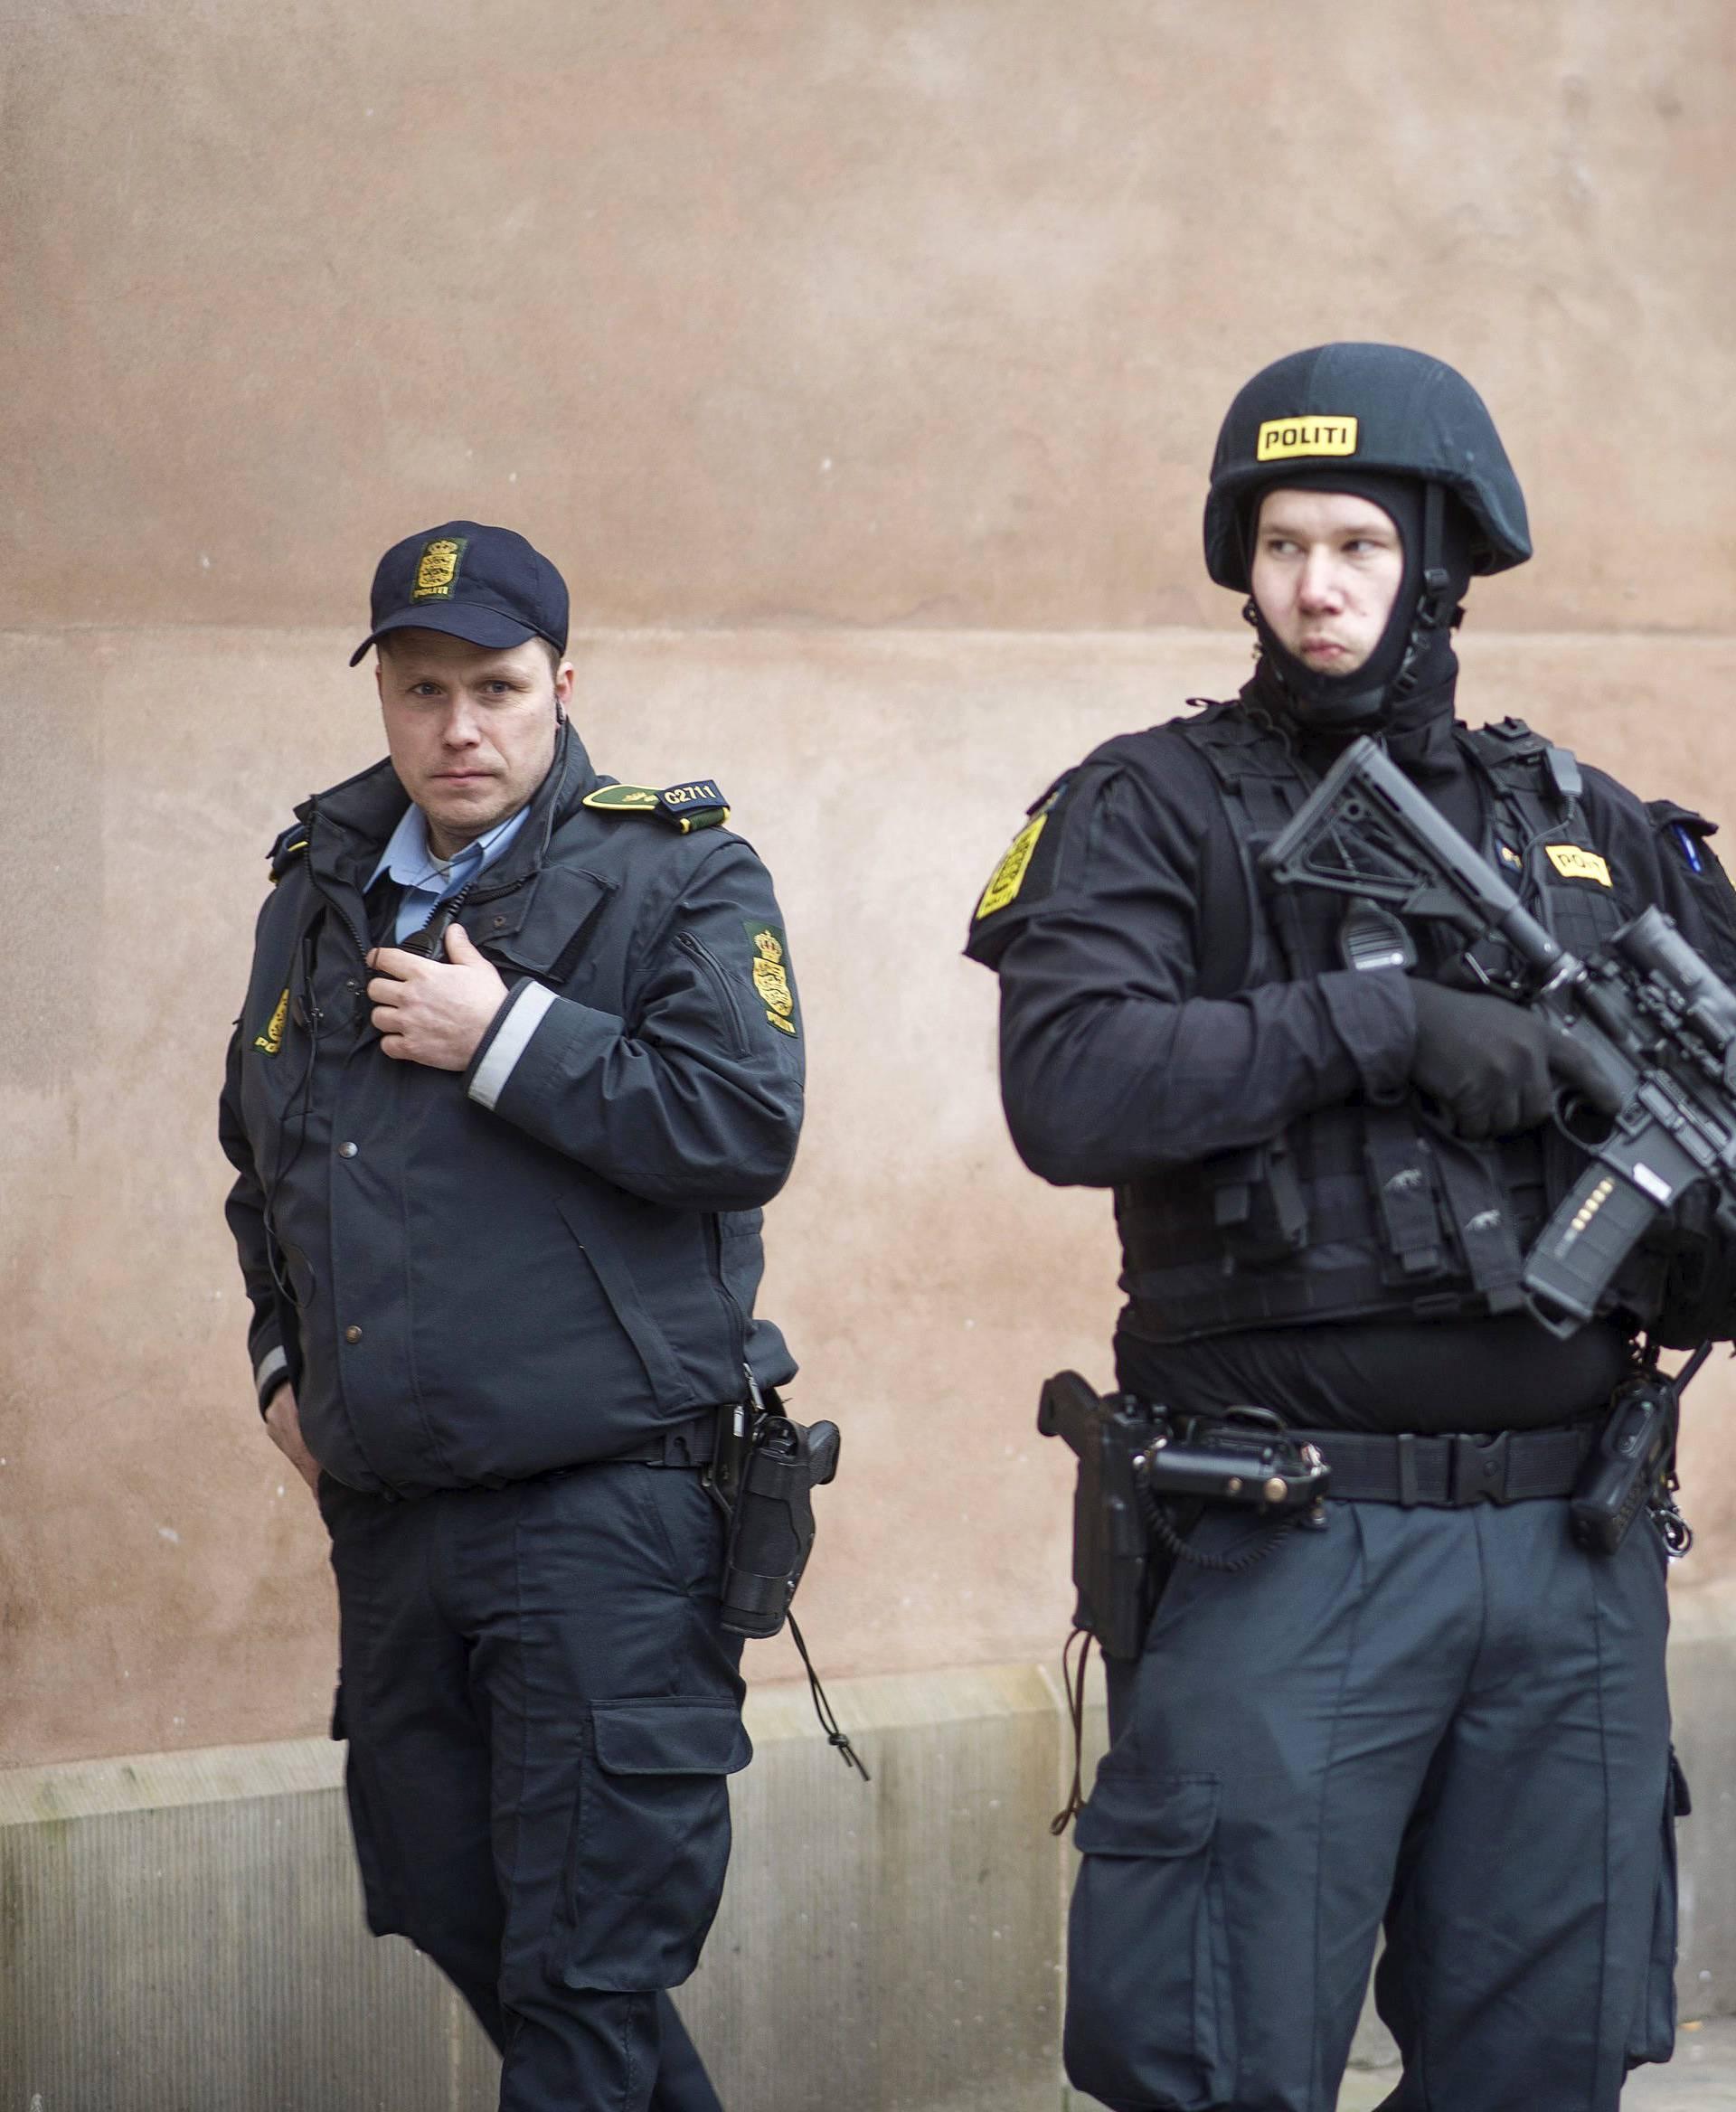 File photo shows Danish police standing guard in Copenhagen